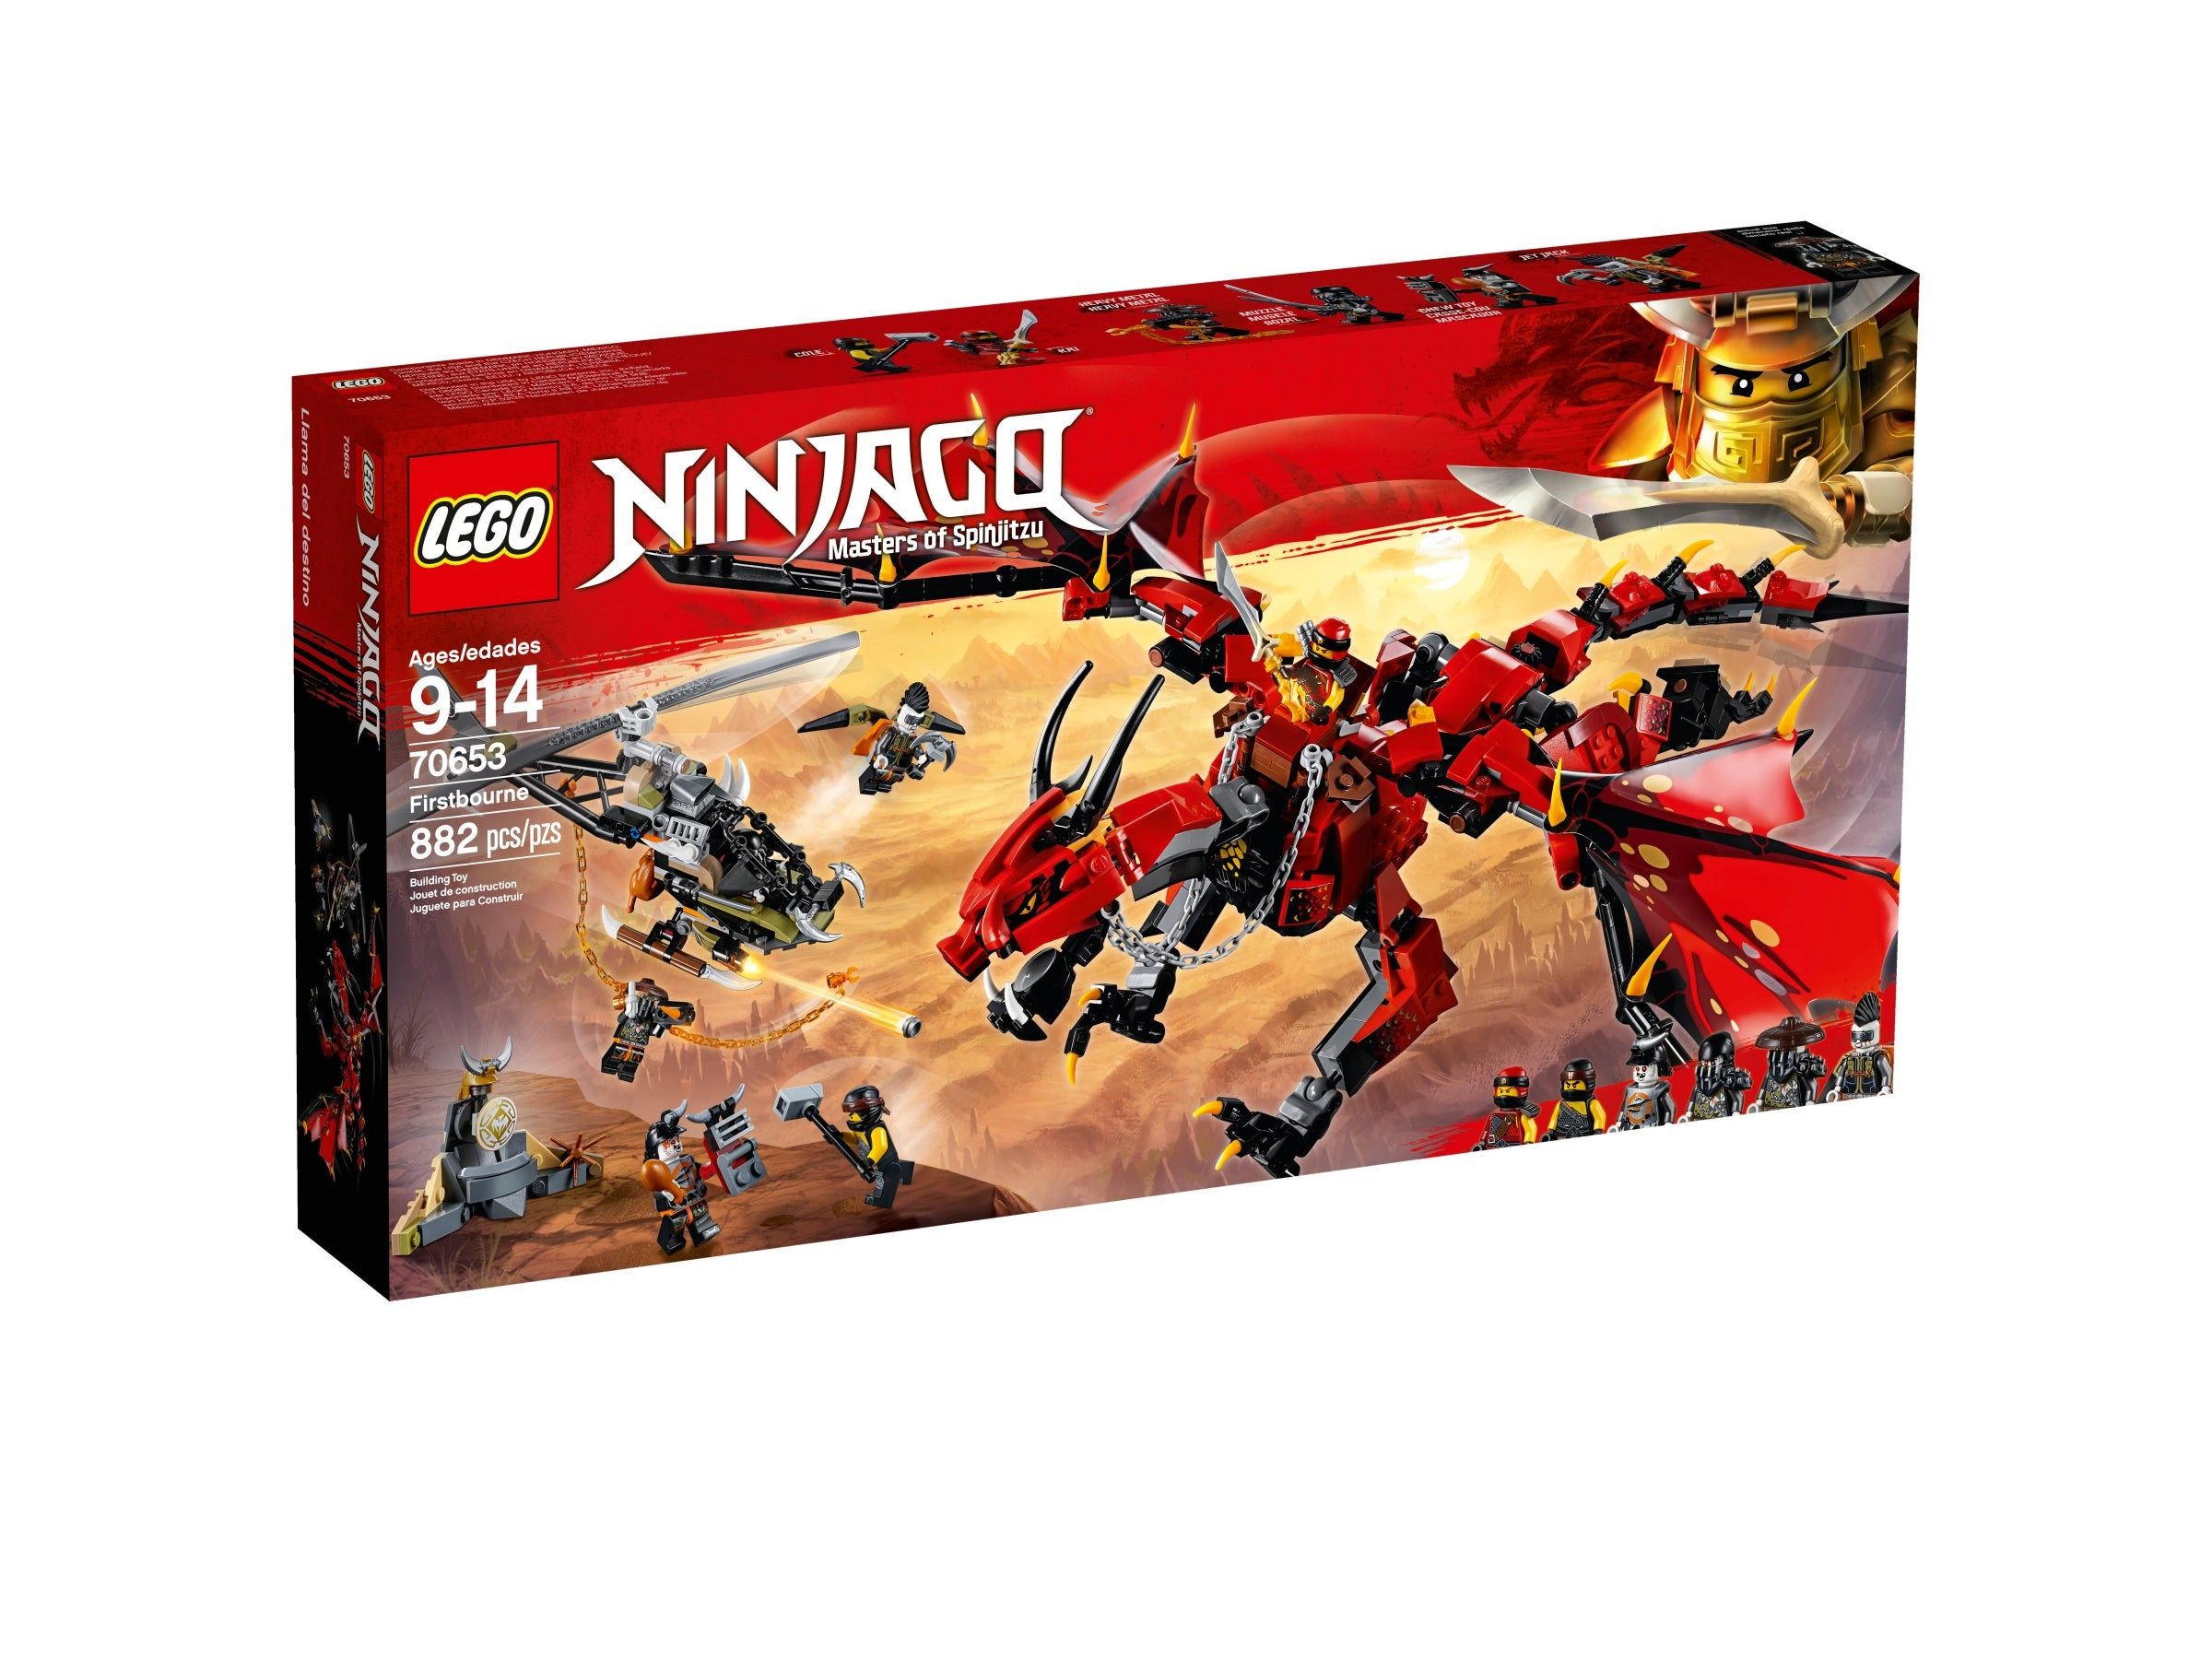 KAI/'S FIRSTBOURNE DRAGON vs MUZZEL /& JET JACK set fits lego figure NINJAGO